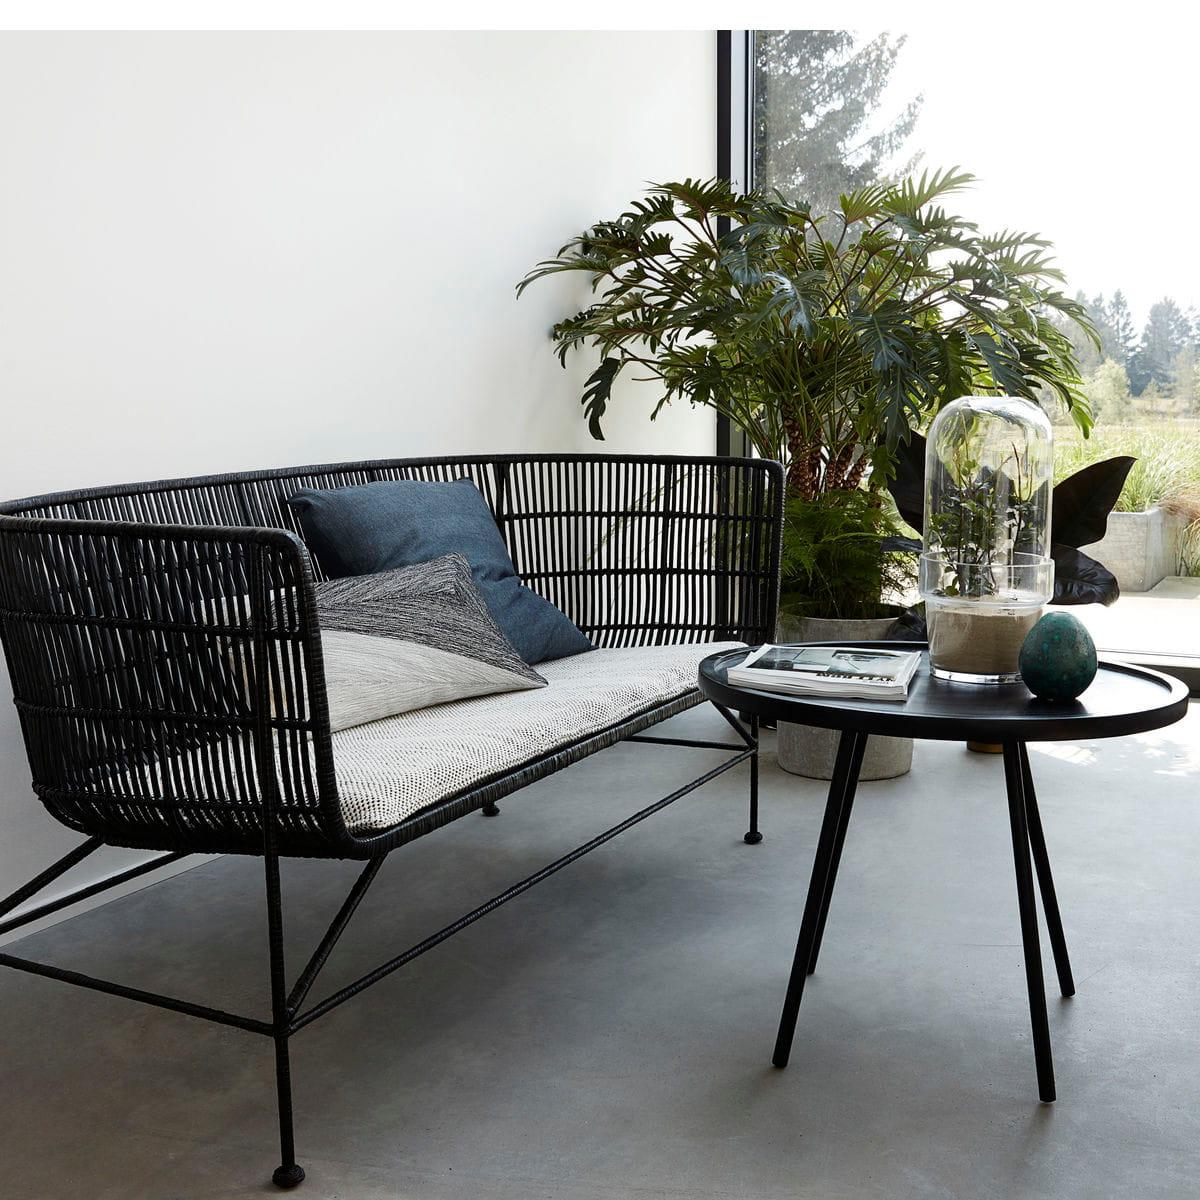 sofa rattanowa cuun black house doctor nordic decoration home. Black Bedroom Furniture Sets. Home Design Ideas